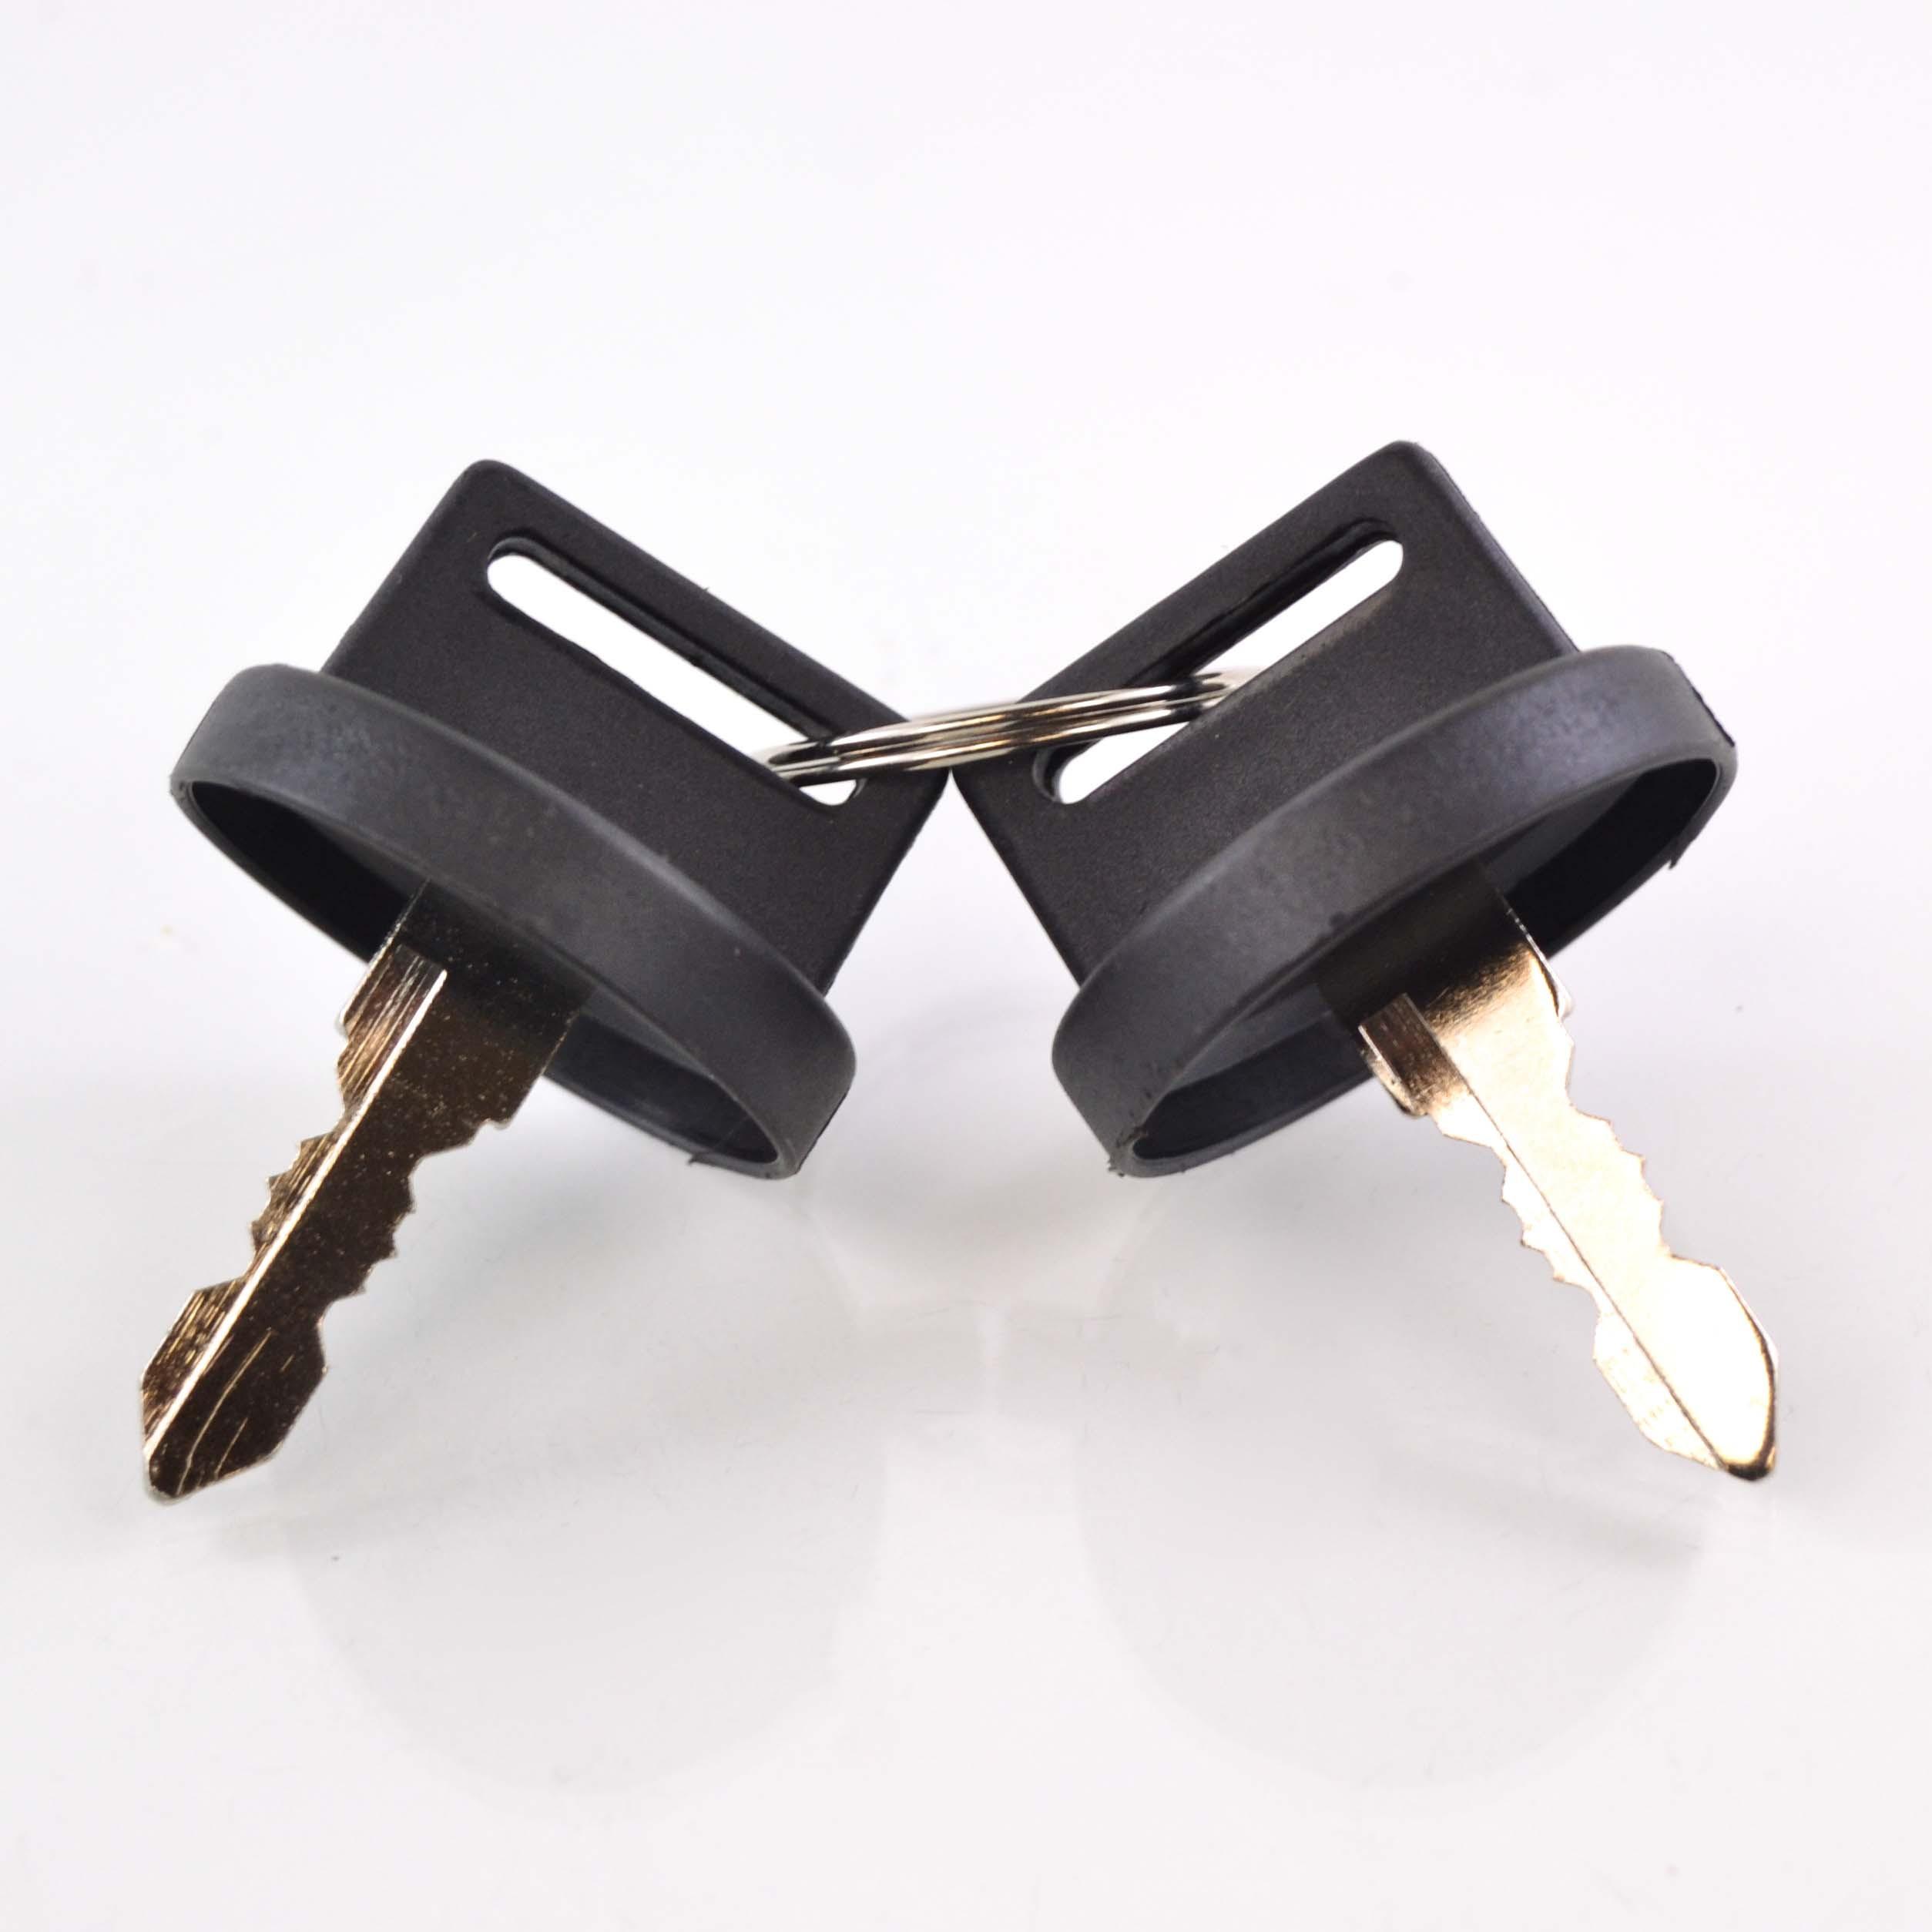 Atv 2010 Honda Trx 420 Rancher Te Rmstator Ignition Key Switch